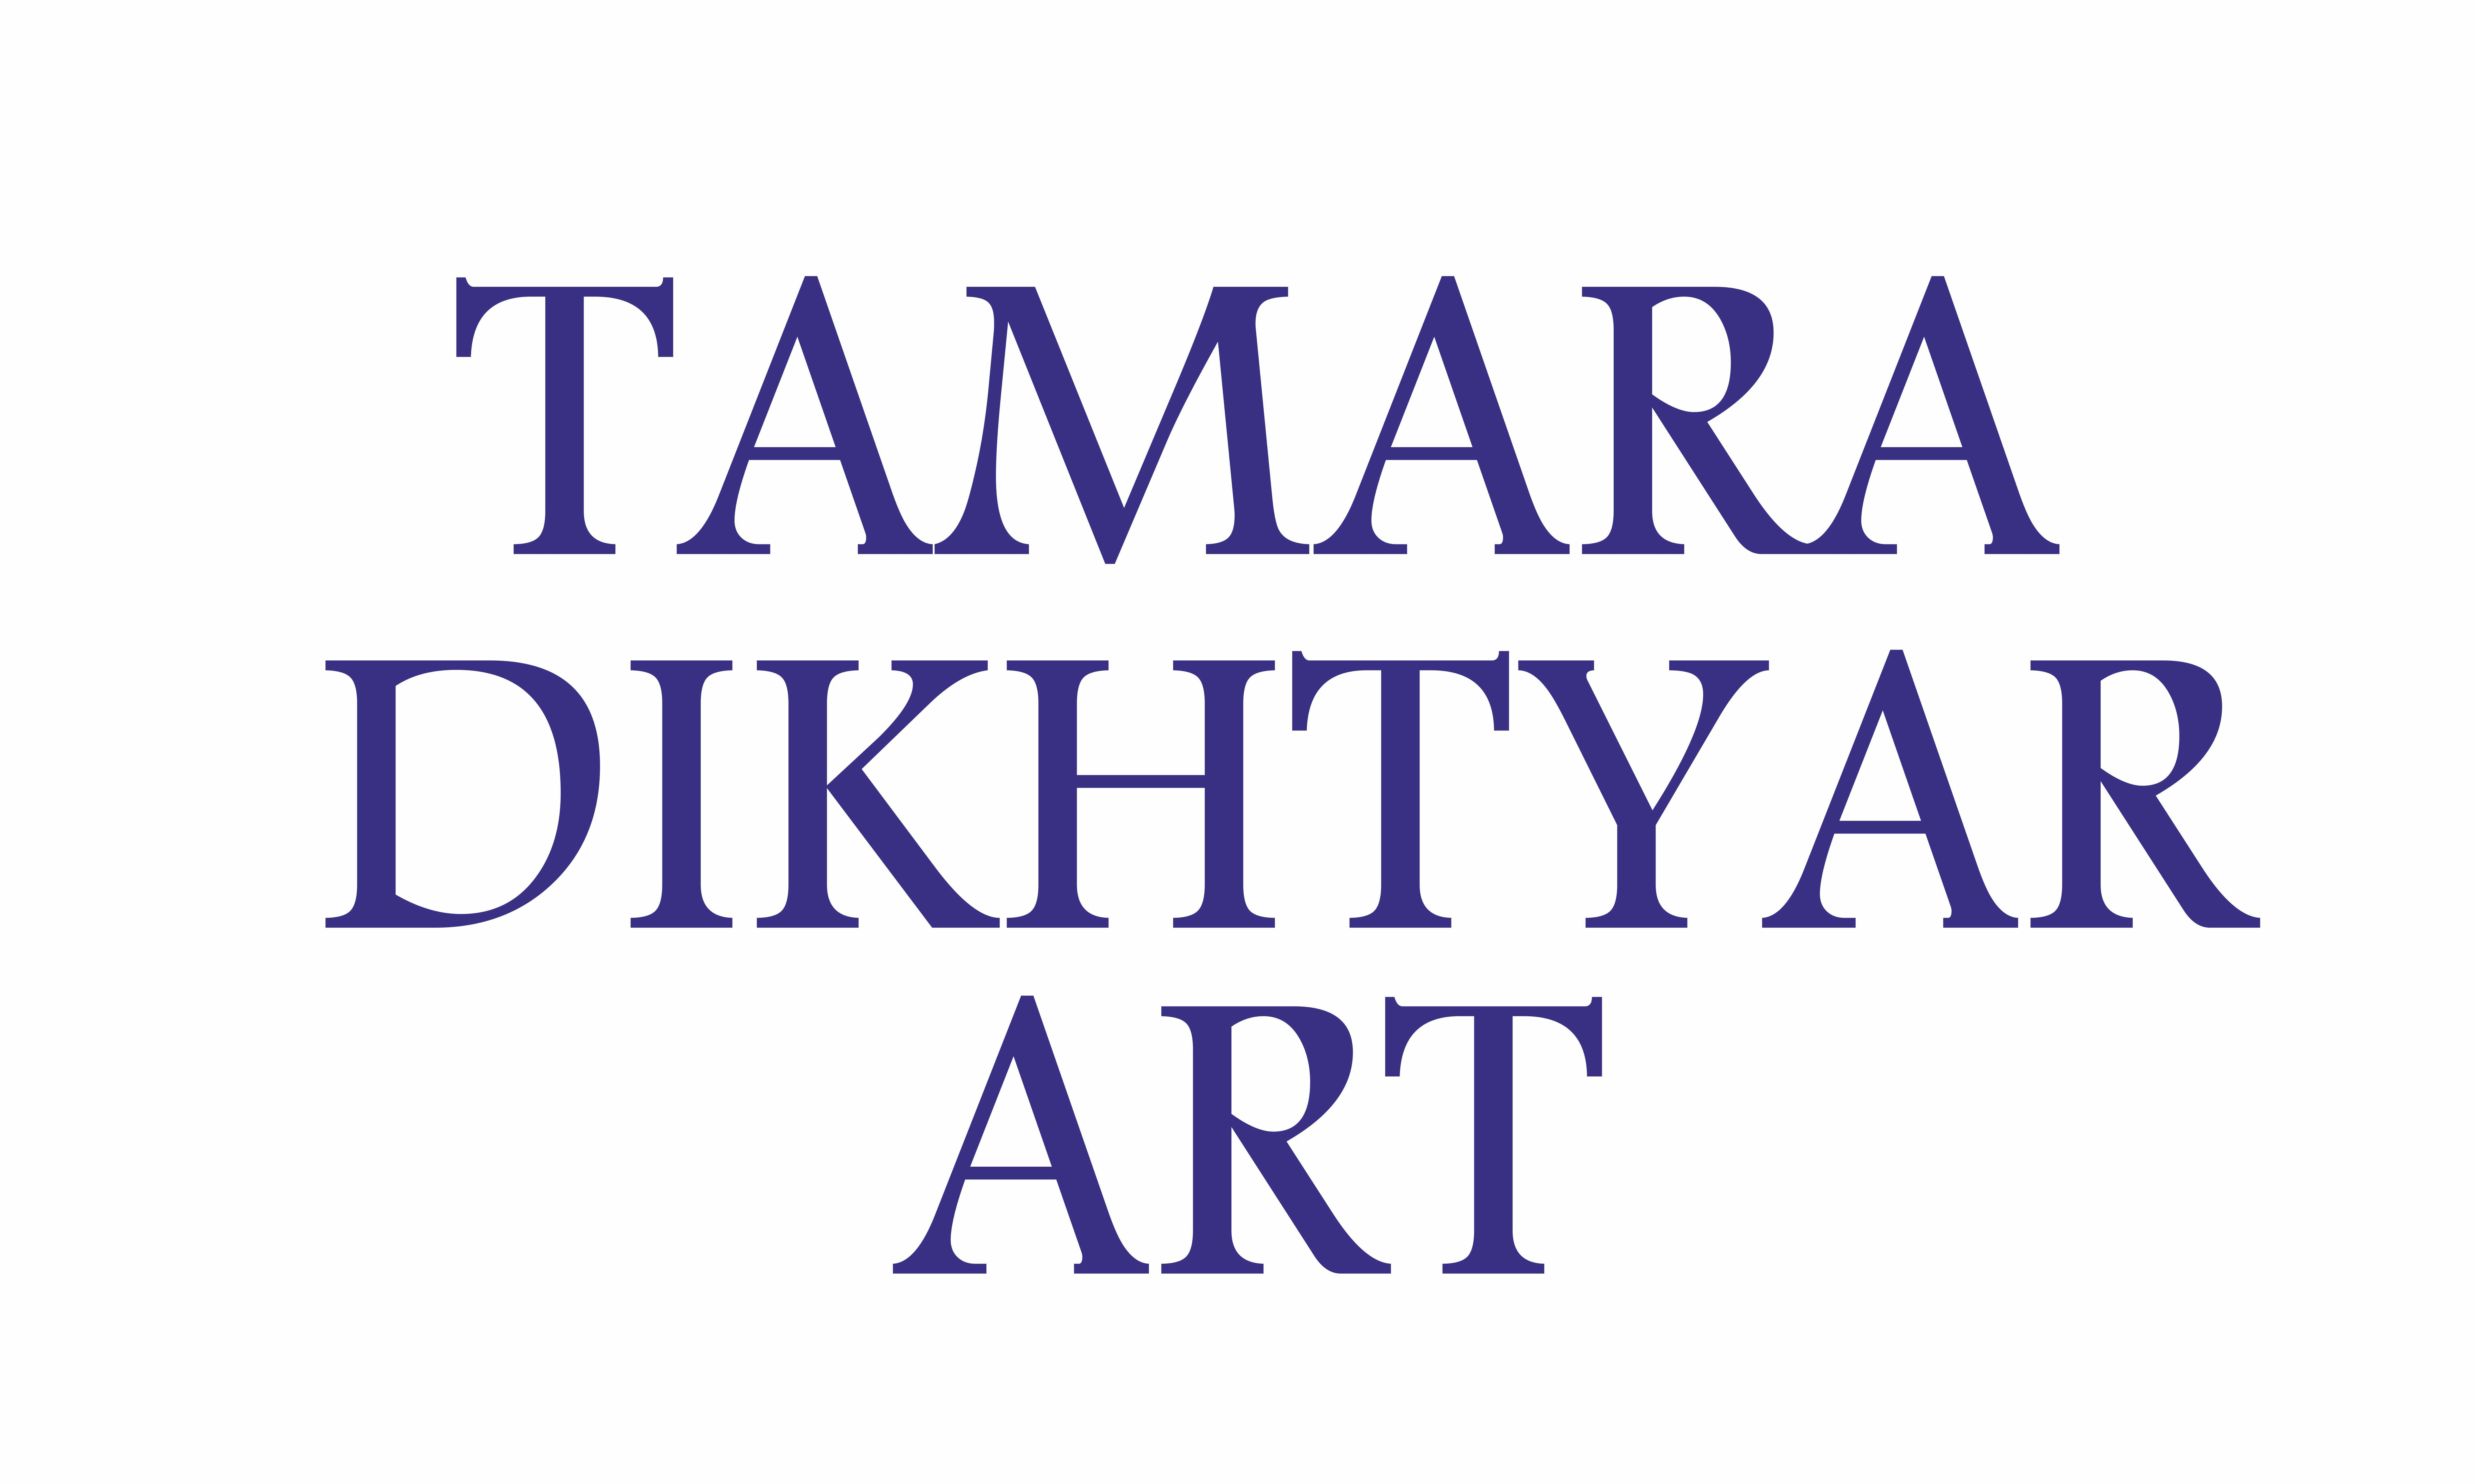 TAMARA DIKHTYAR ART